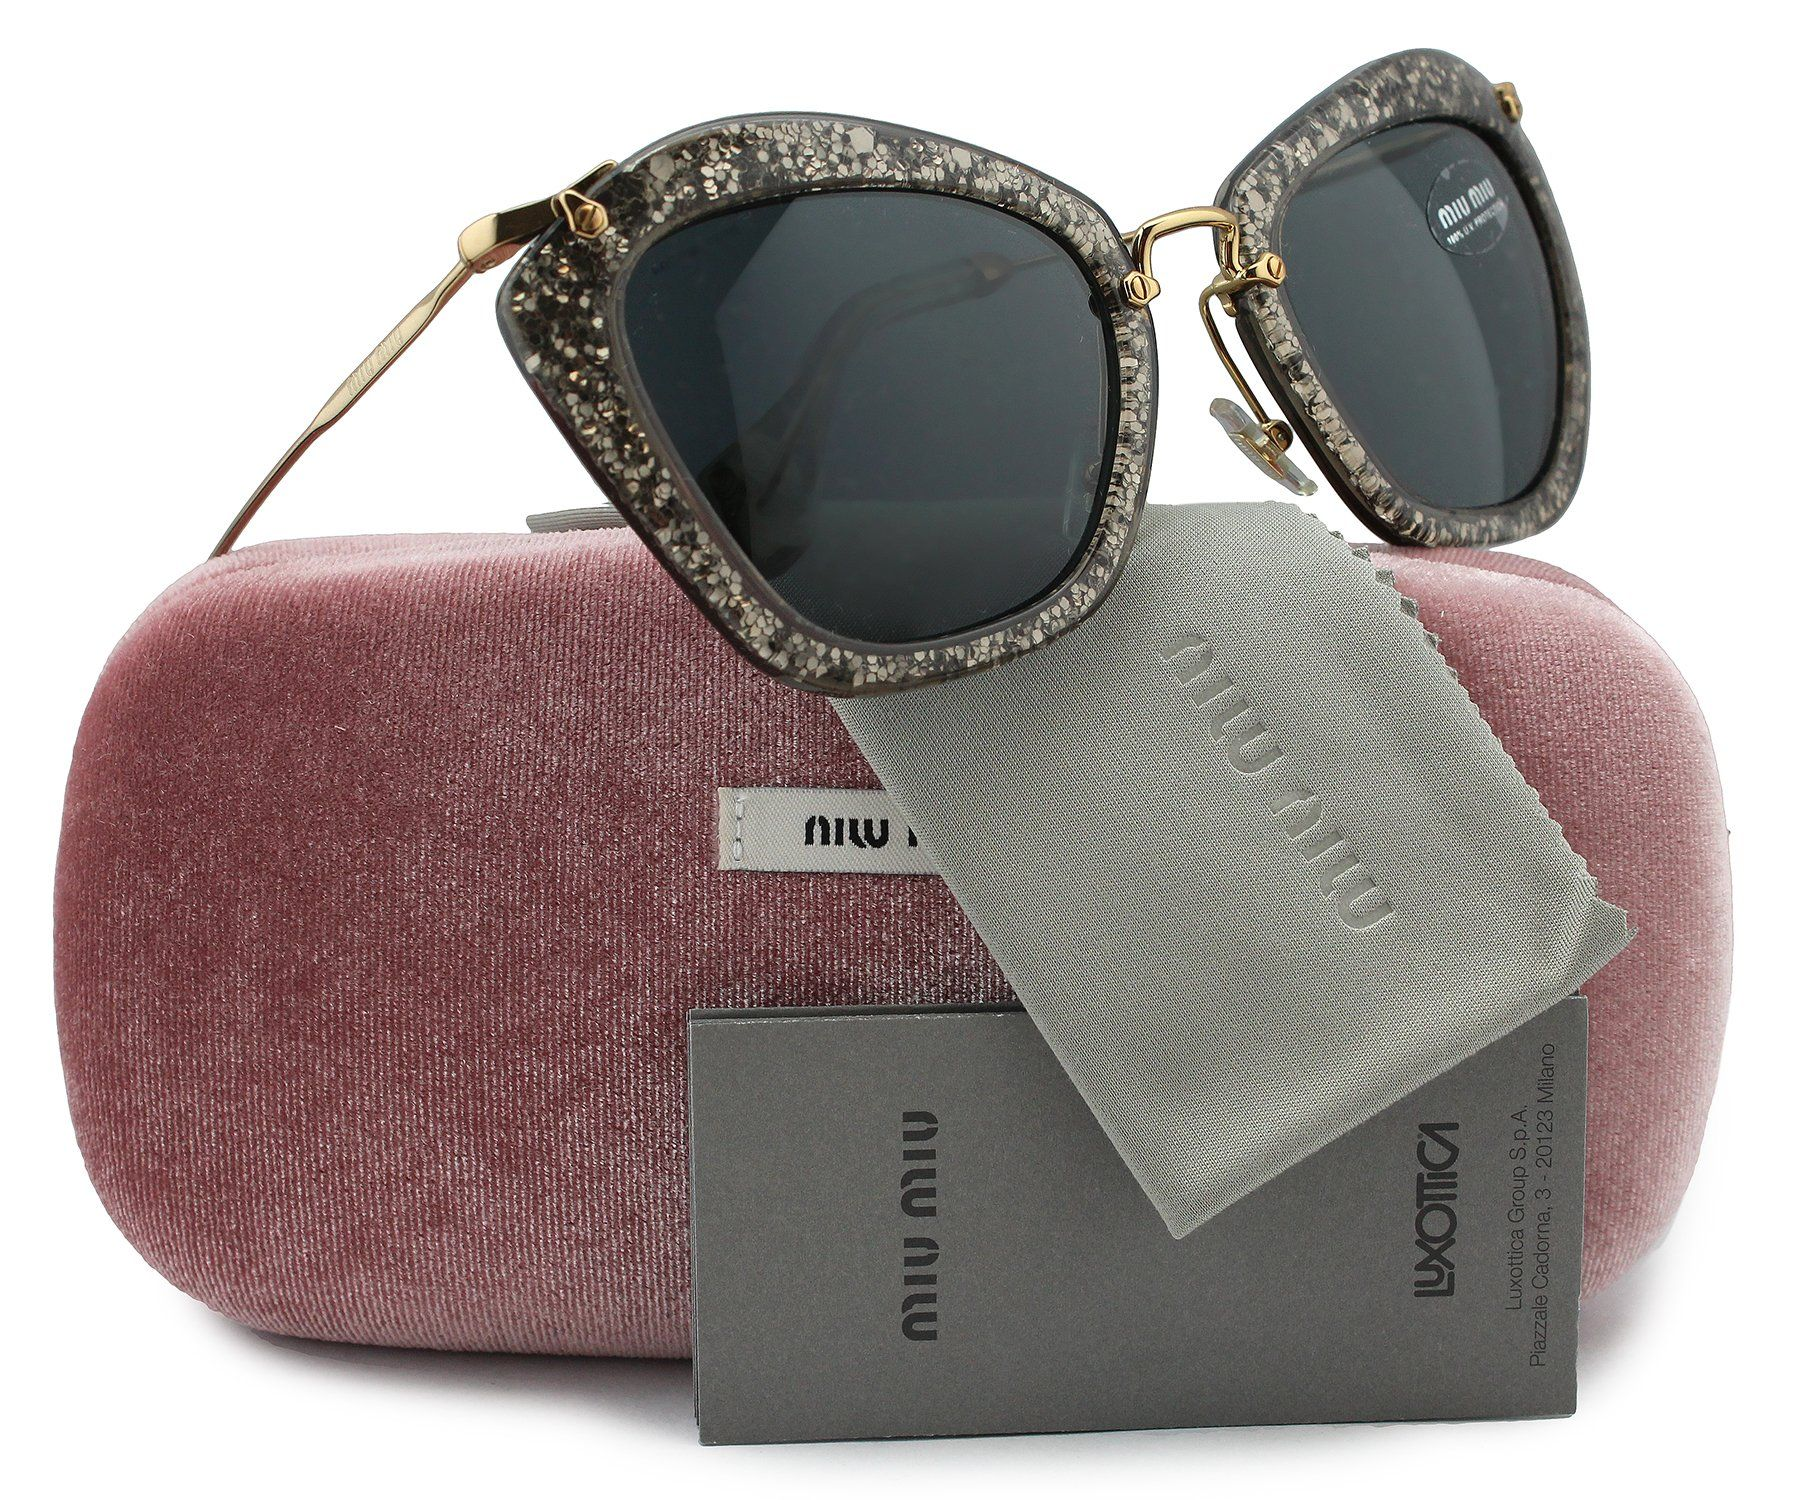 48e611a5c9c21 Amazon.com  MIU MIU SMU10N Noir Sunglasses Smoke Glitter Silver w Crystal  Grey (IAH-1A1) SMU 10N IAH1A1 55mm Authentic  Clothing